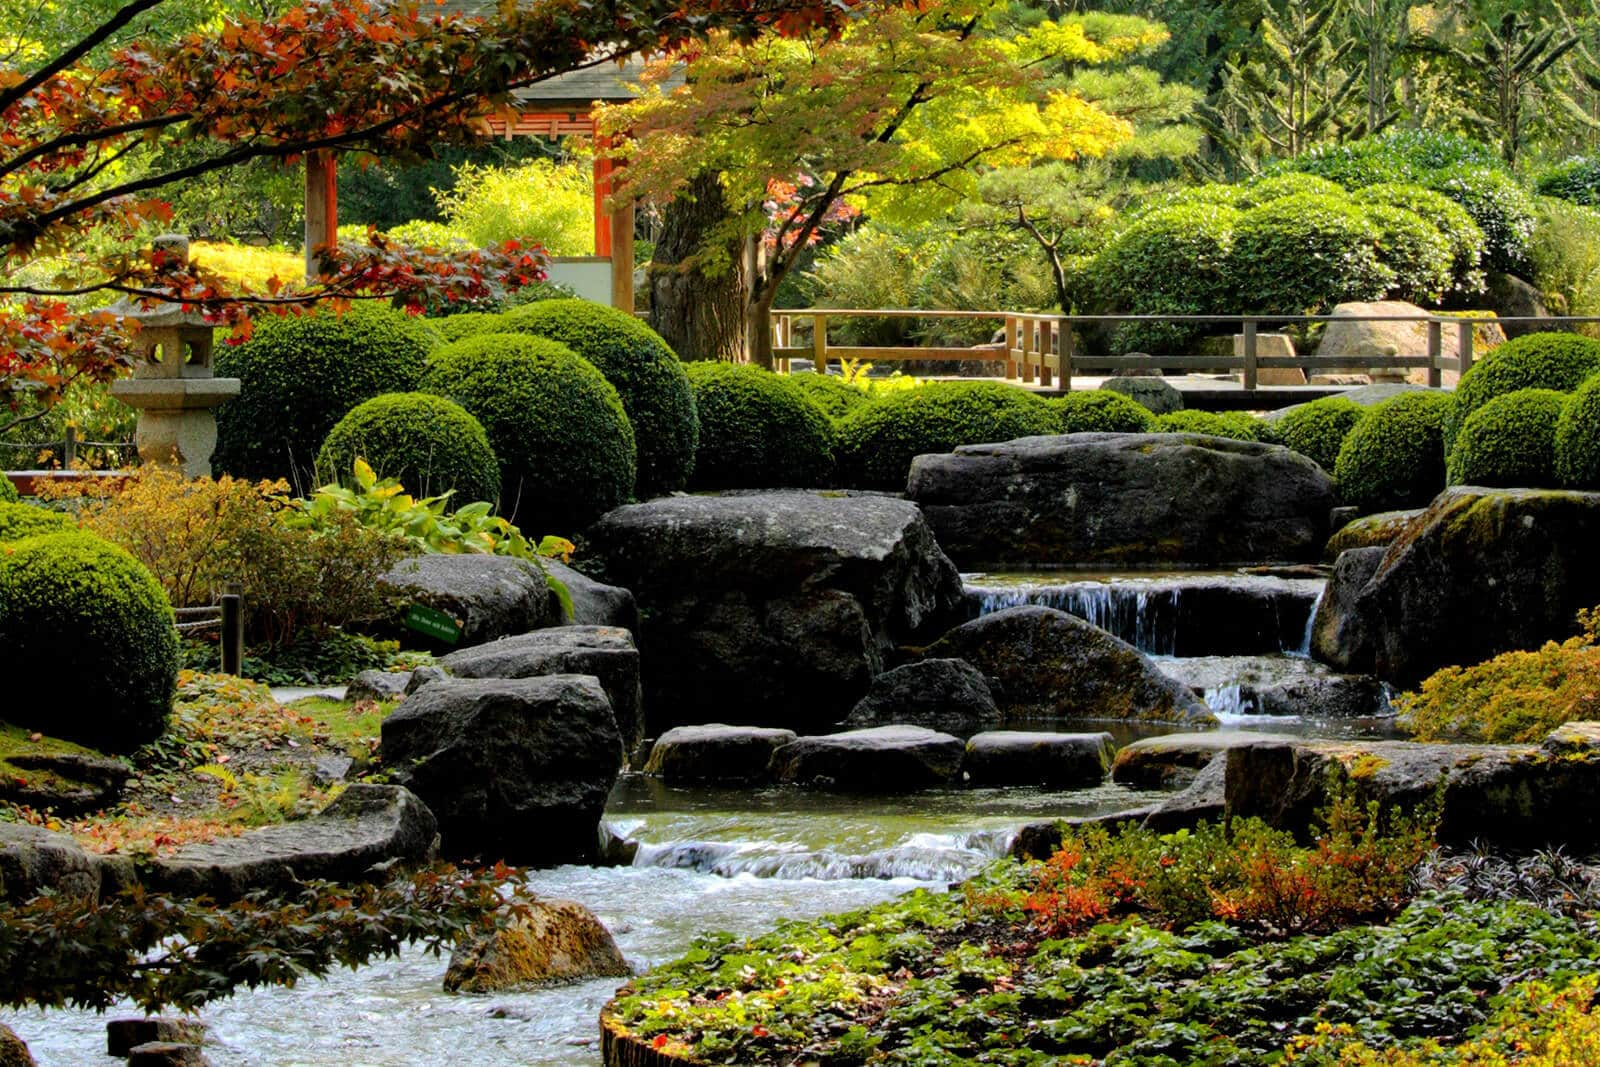 Feng Shui Garten selber gestalten/anlegen - Pflanzen, Beispiele & Bilder